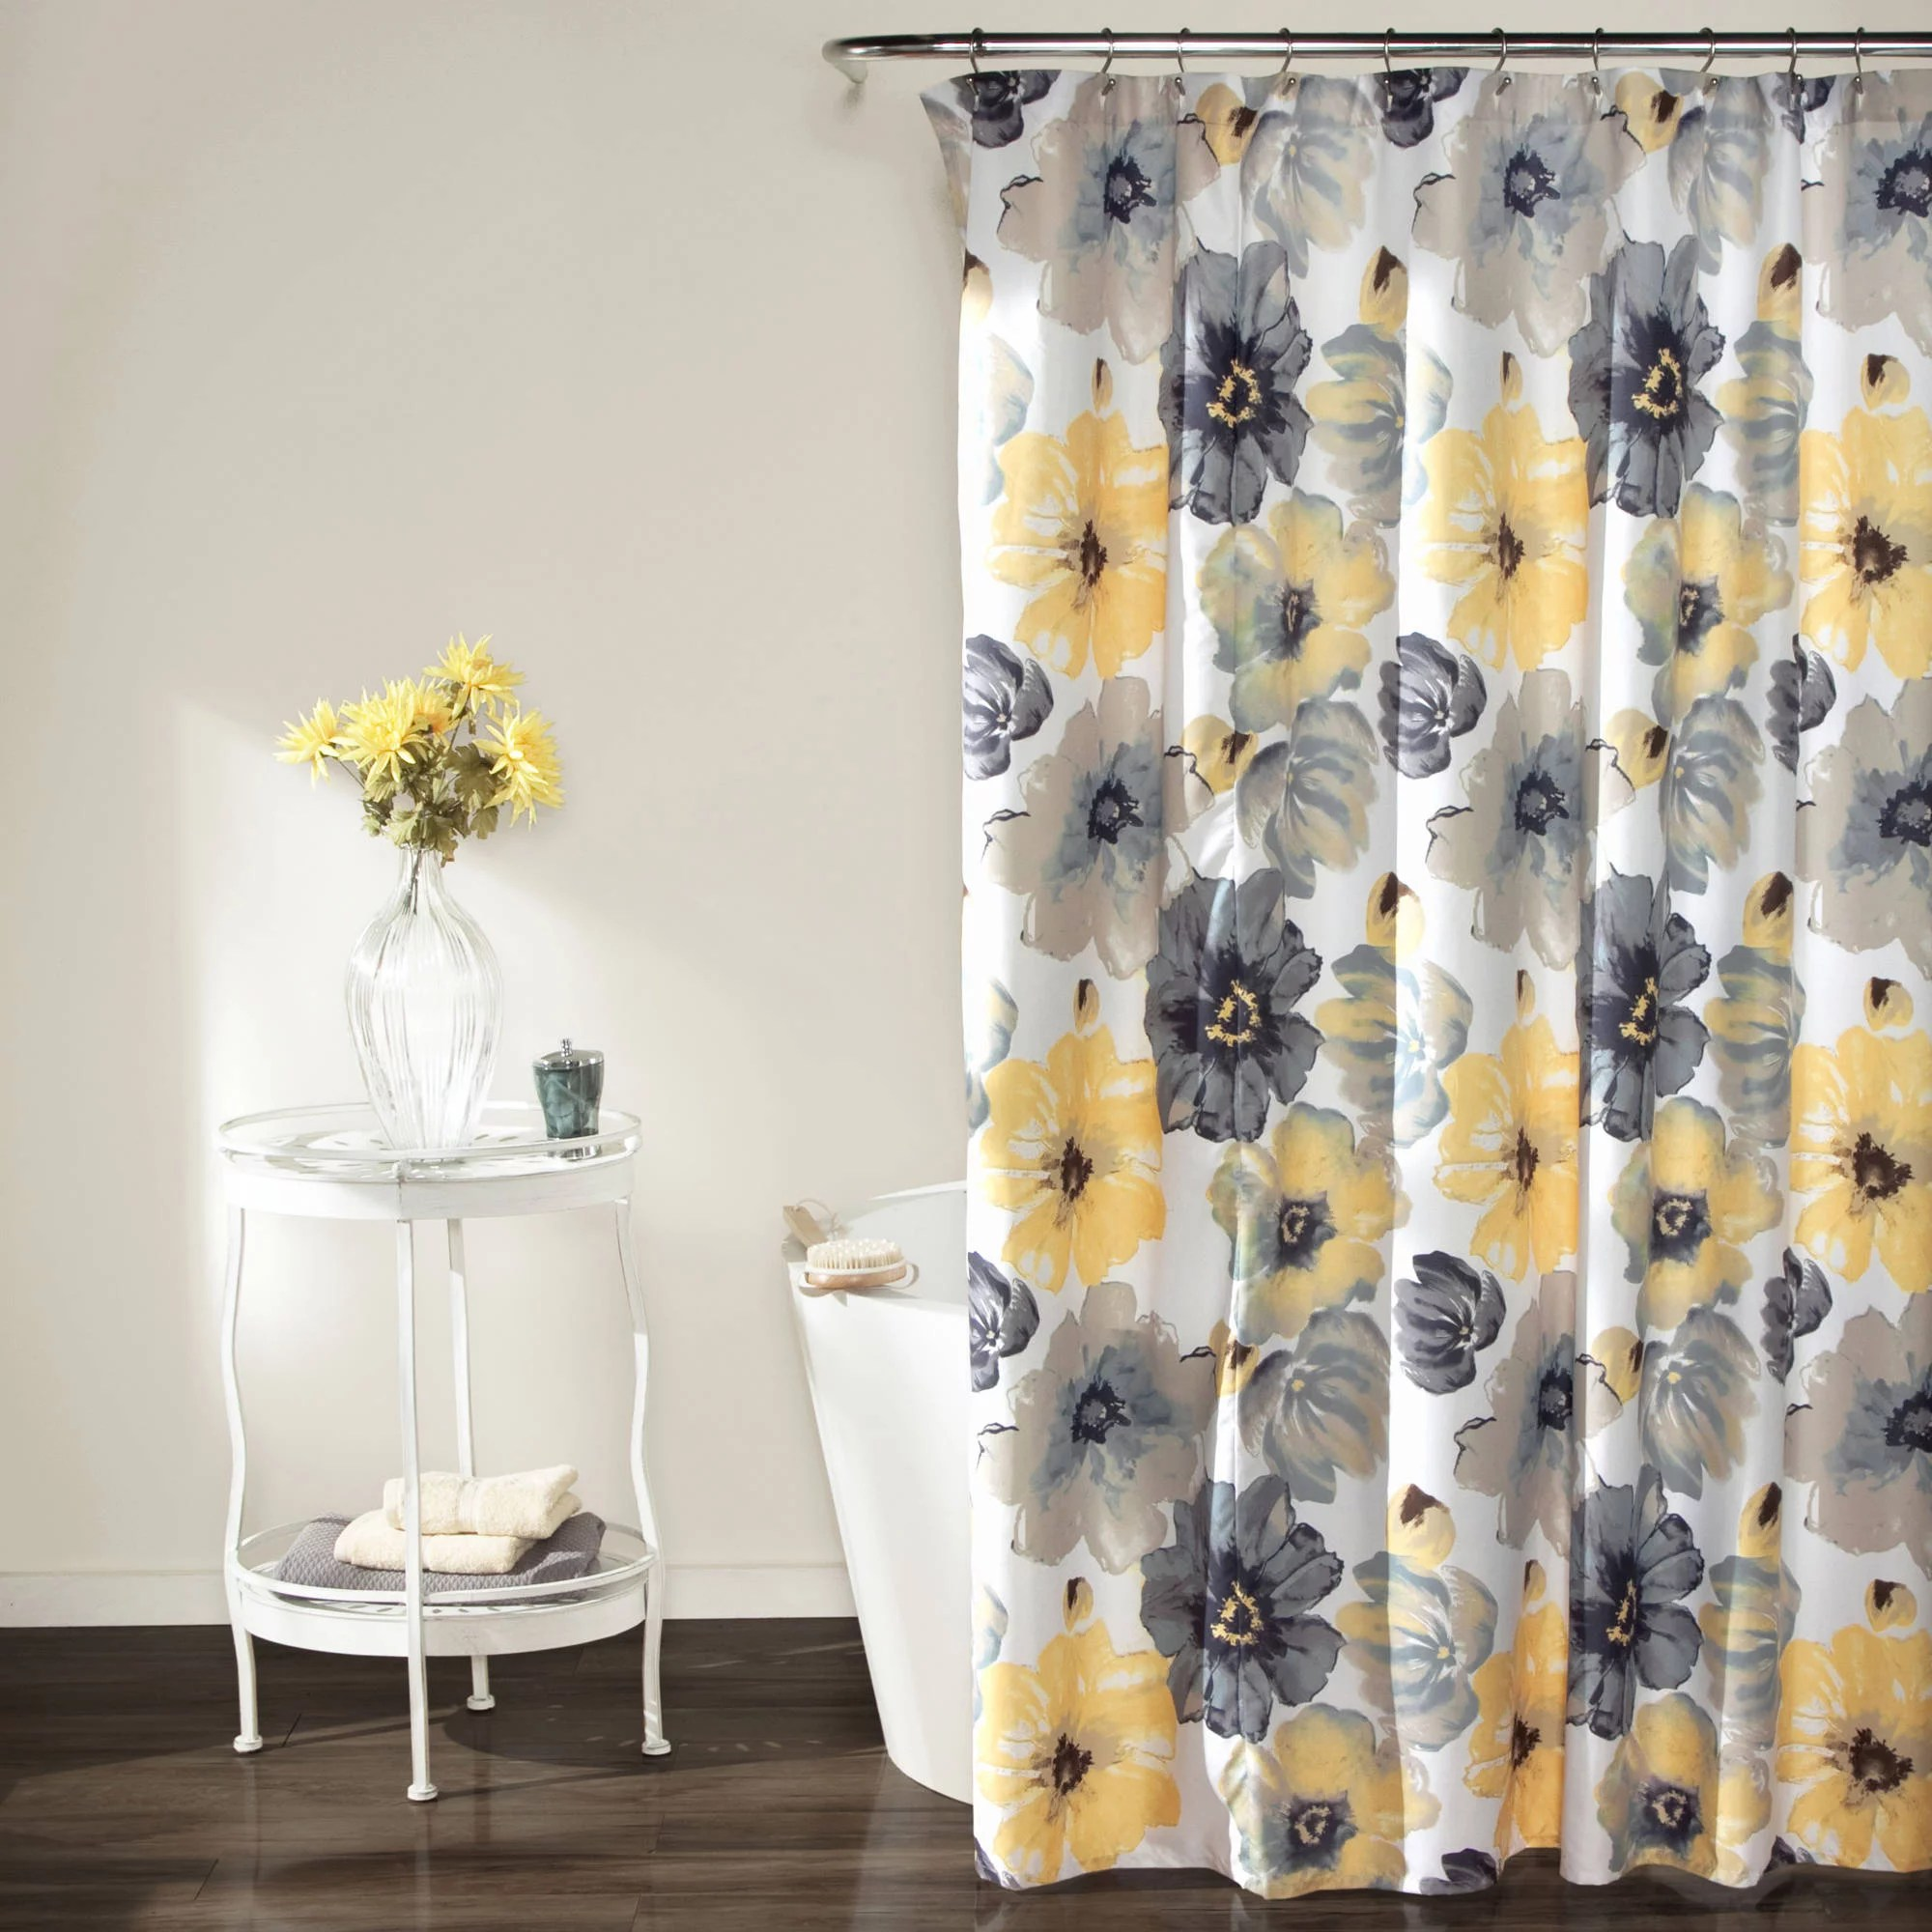 sunflower decor shower curtain set helianthus sunflowers against weathered aged fence summer garden photo print bathroom accessories 69w x 70l